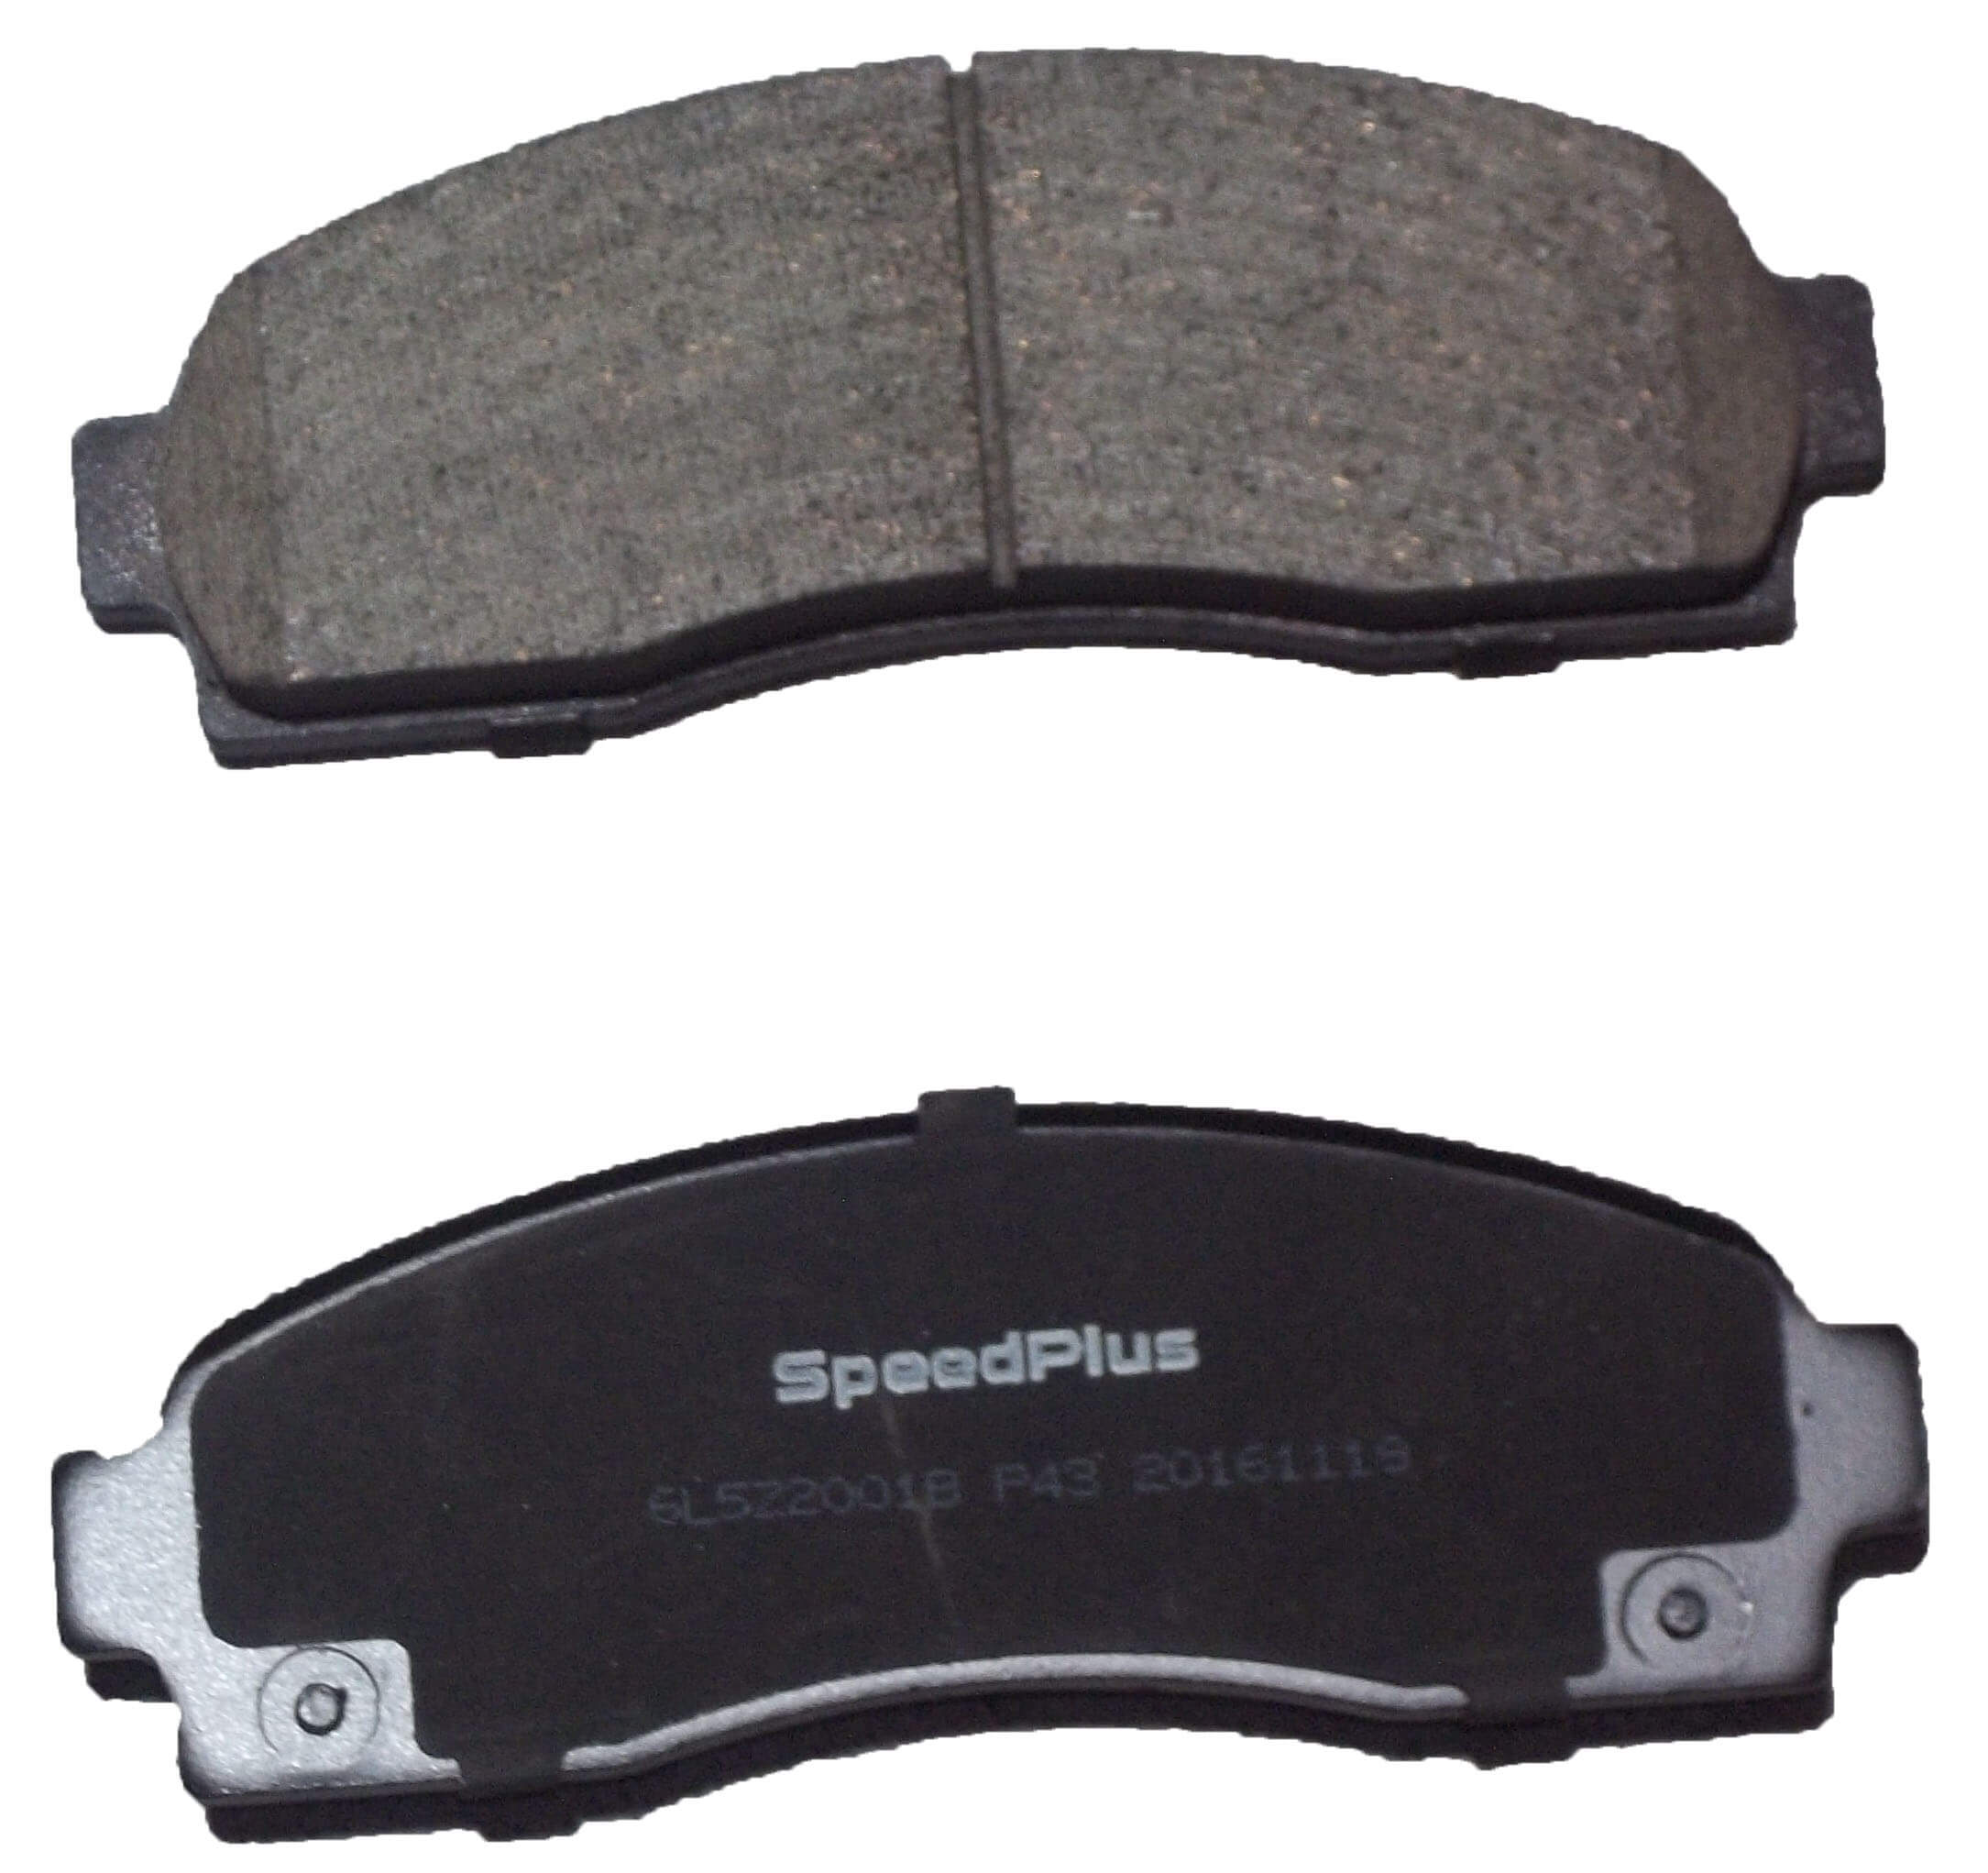 Max Performance Ceramic Brake Pads F+R See Desc. 2011 Fits Nissan Murano